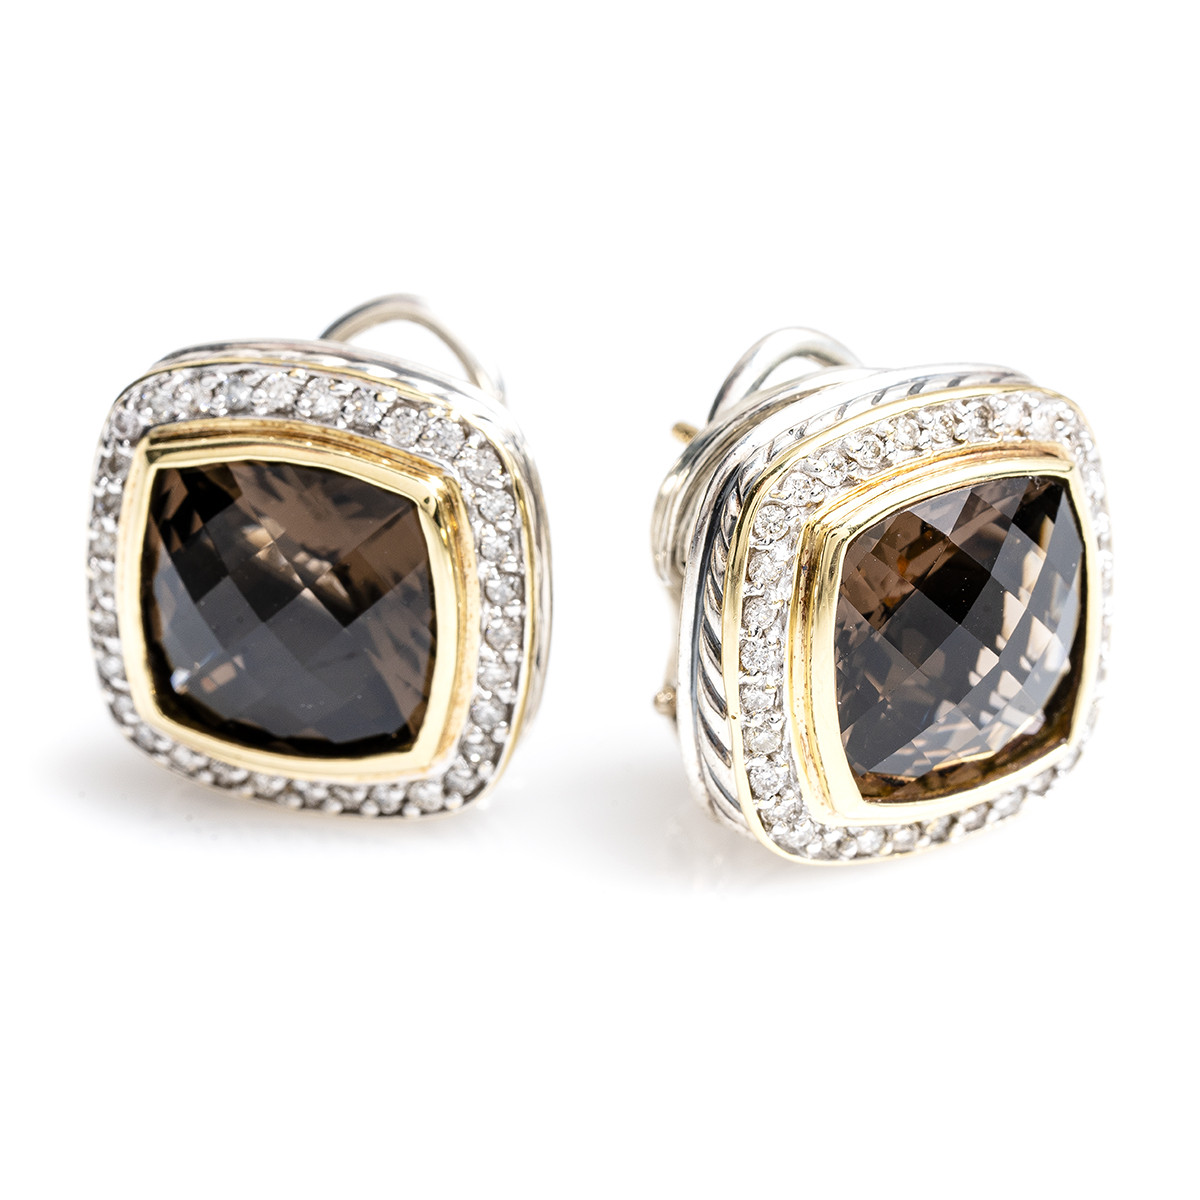 Vintage David Yurman 0.64 CTW Diamond & Smokey Quartz Albion Earrings